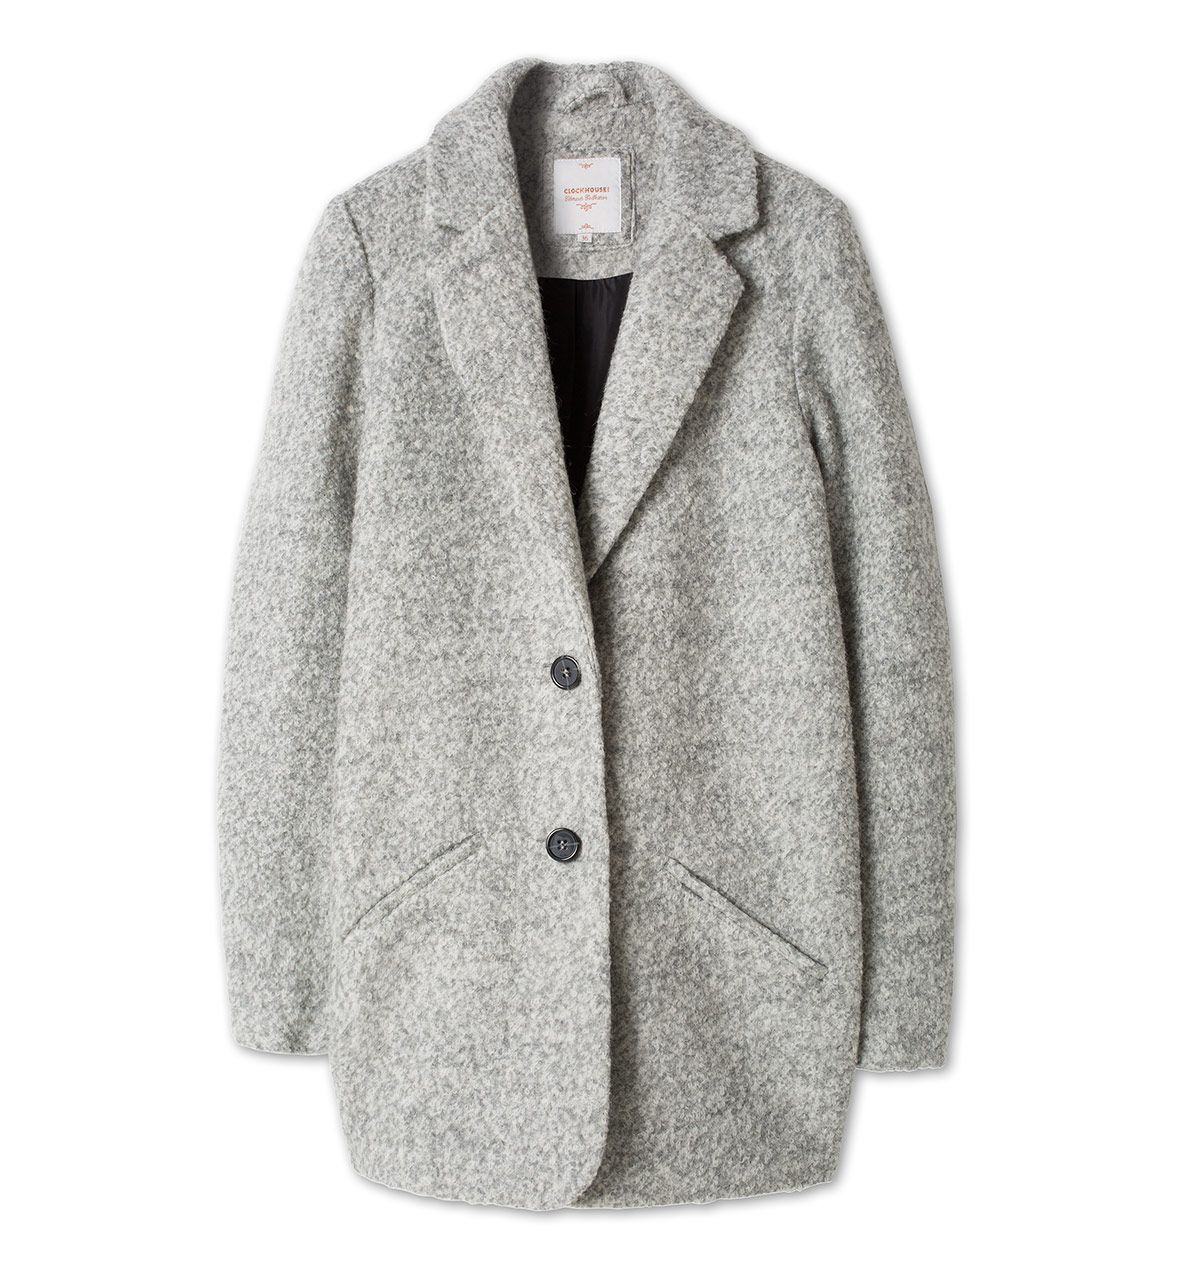 Marvelous Damen M ntel g nstig Jacken u M ntel online kaufen C uA